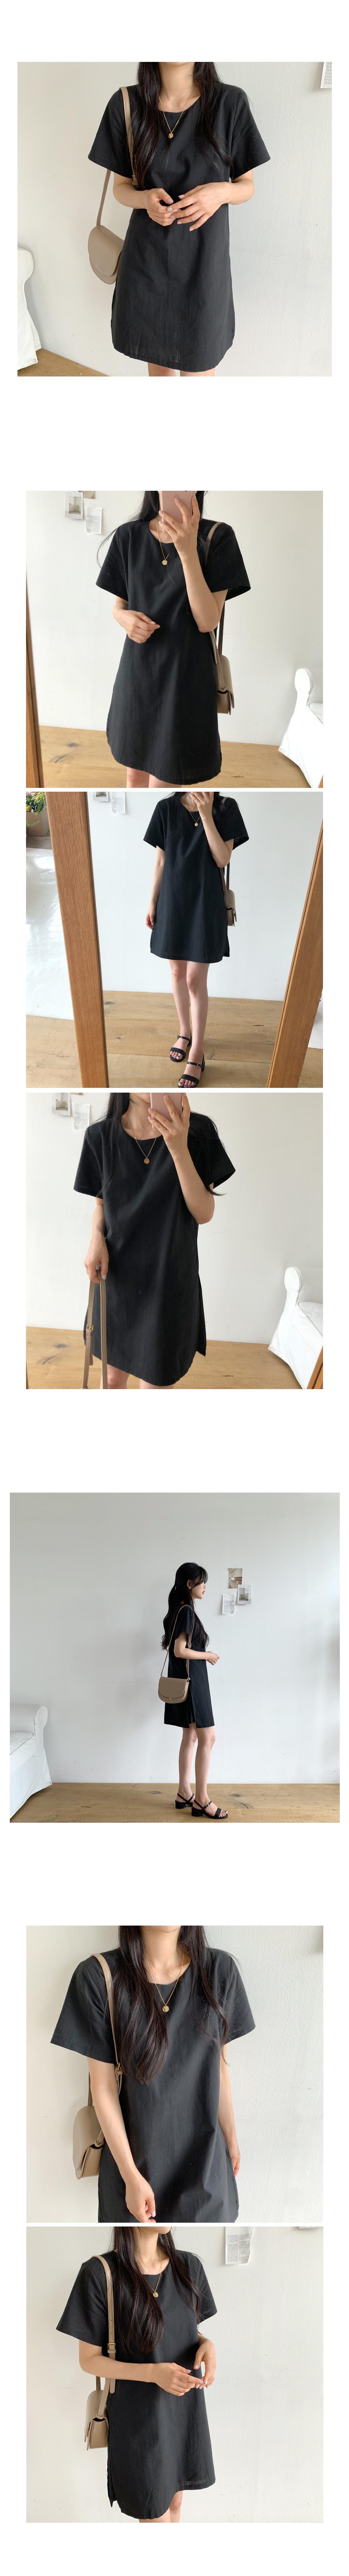 Barley linen mini dress